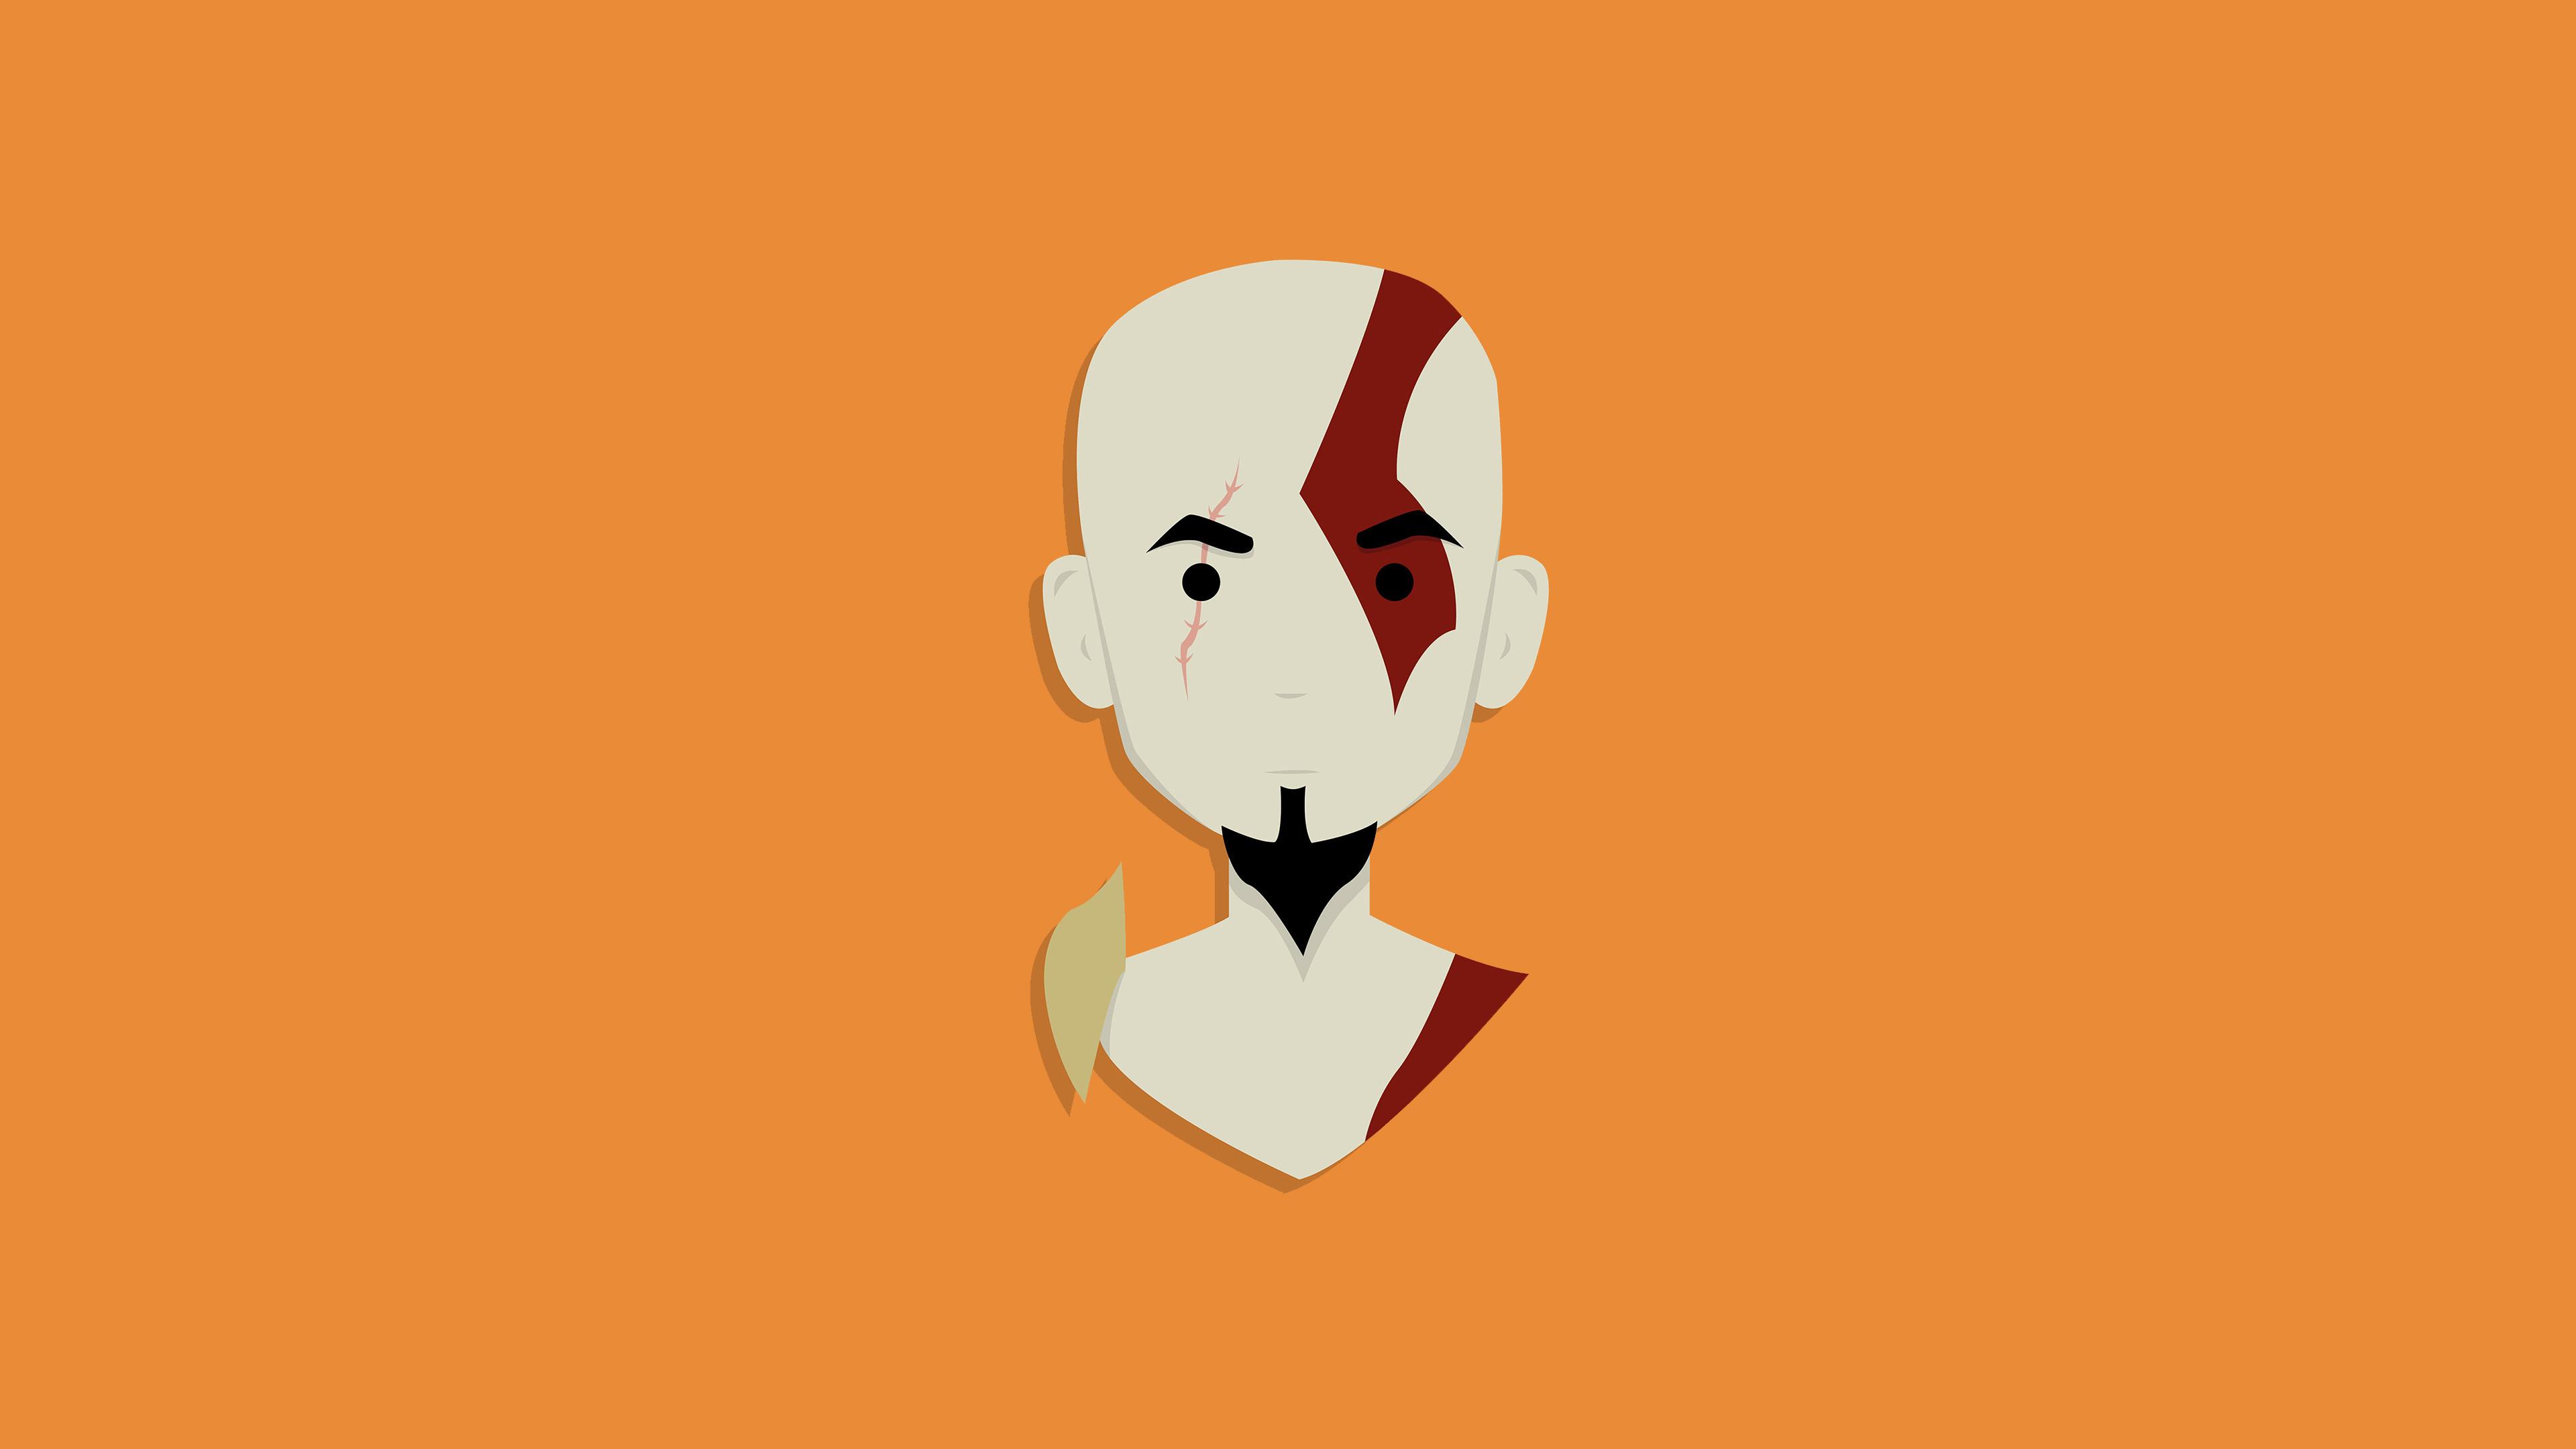 kratos-god-of-war-minimalist-4k-pv.jpg